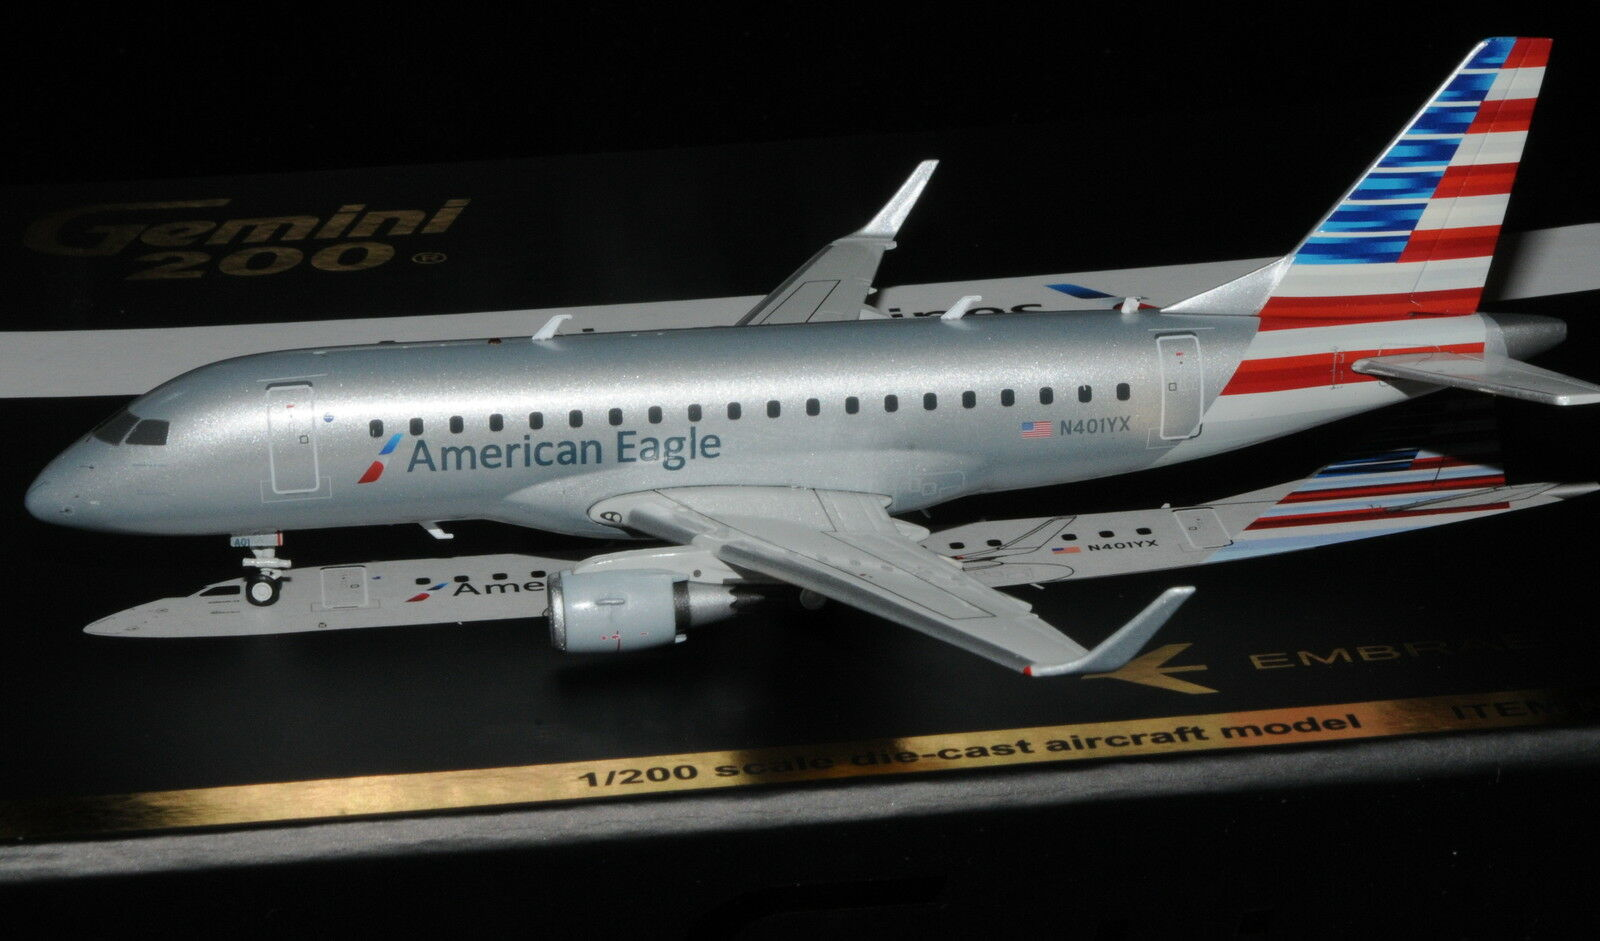 Gemini Jets 1 200 Embraer erj-170 American Eagle n401yx